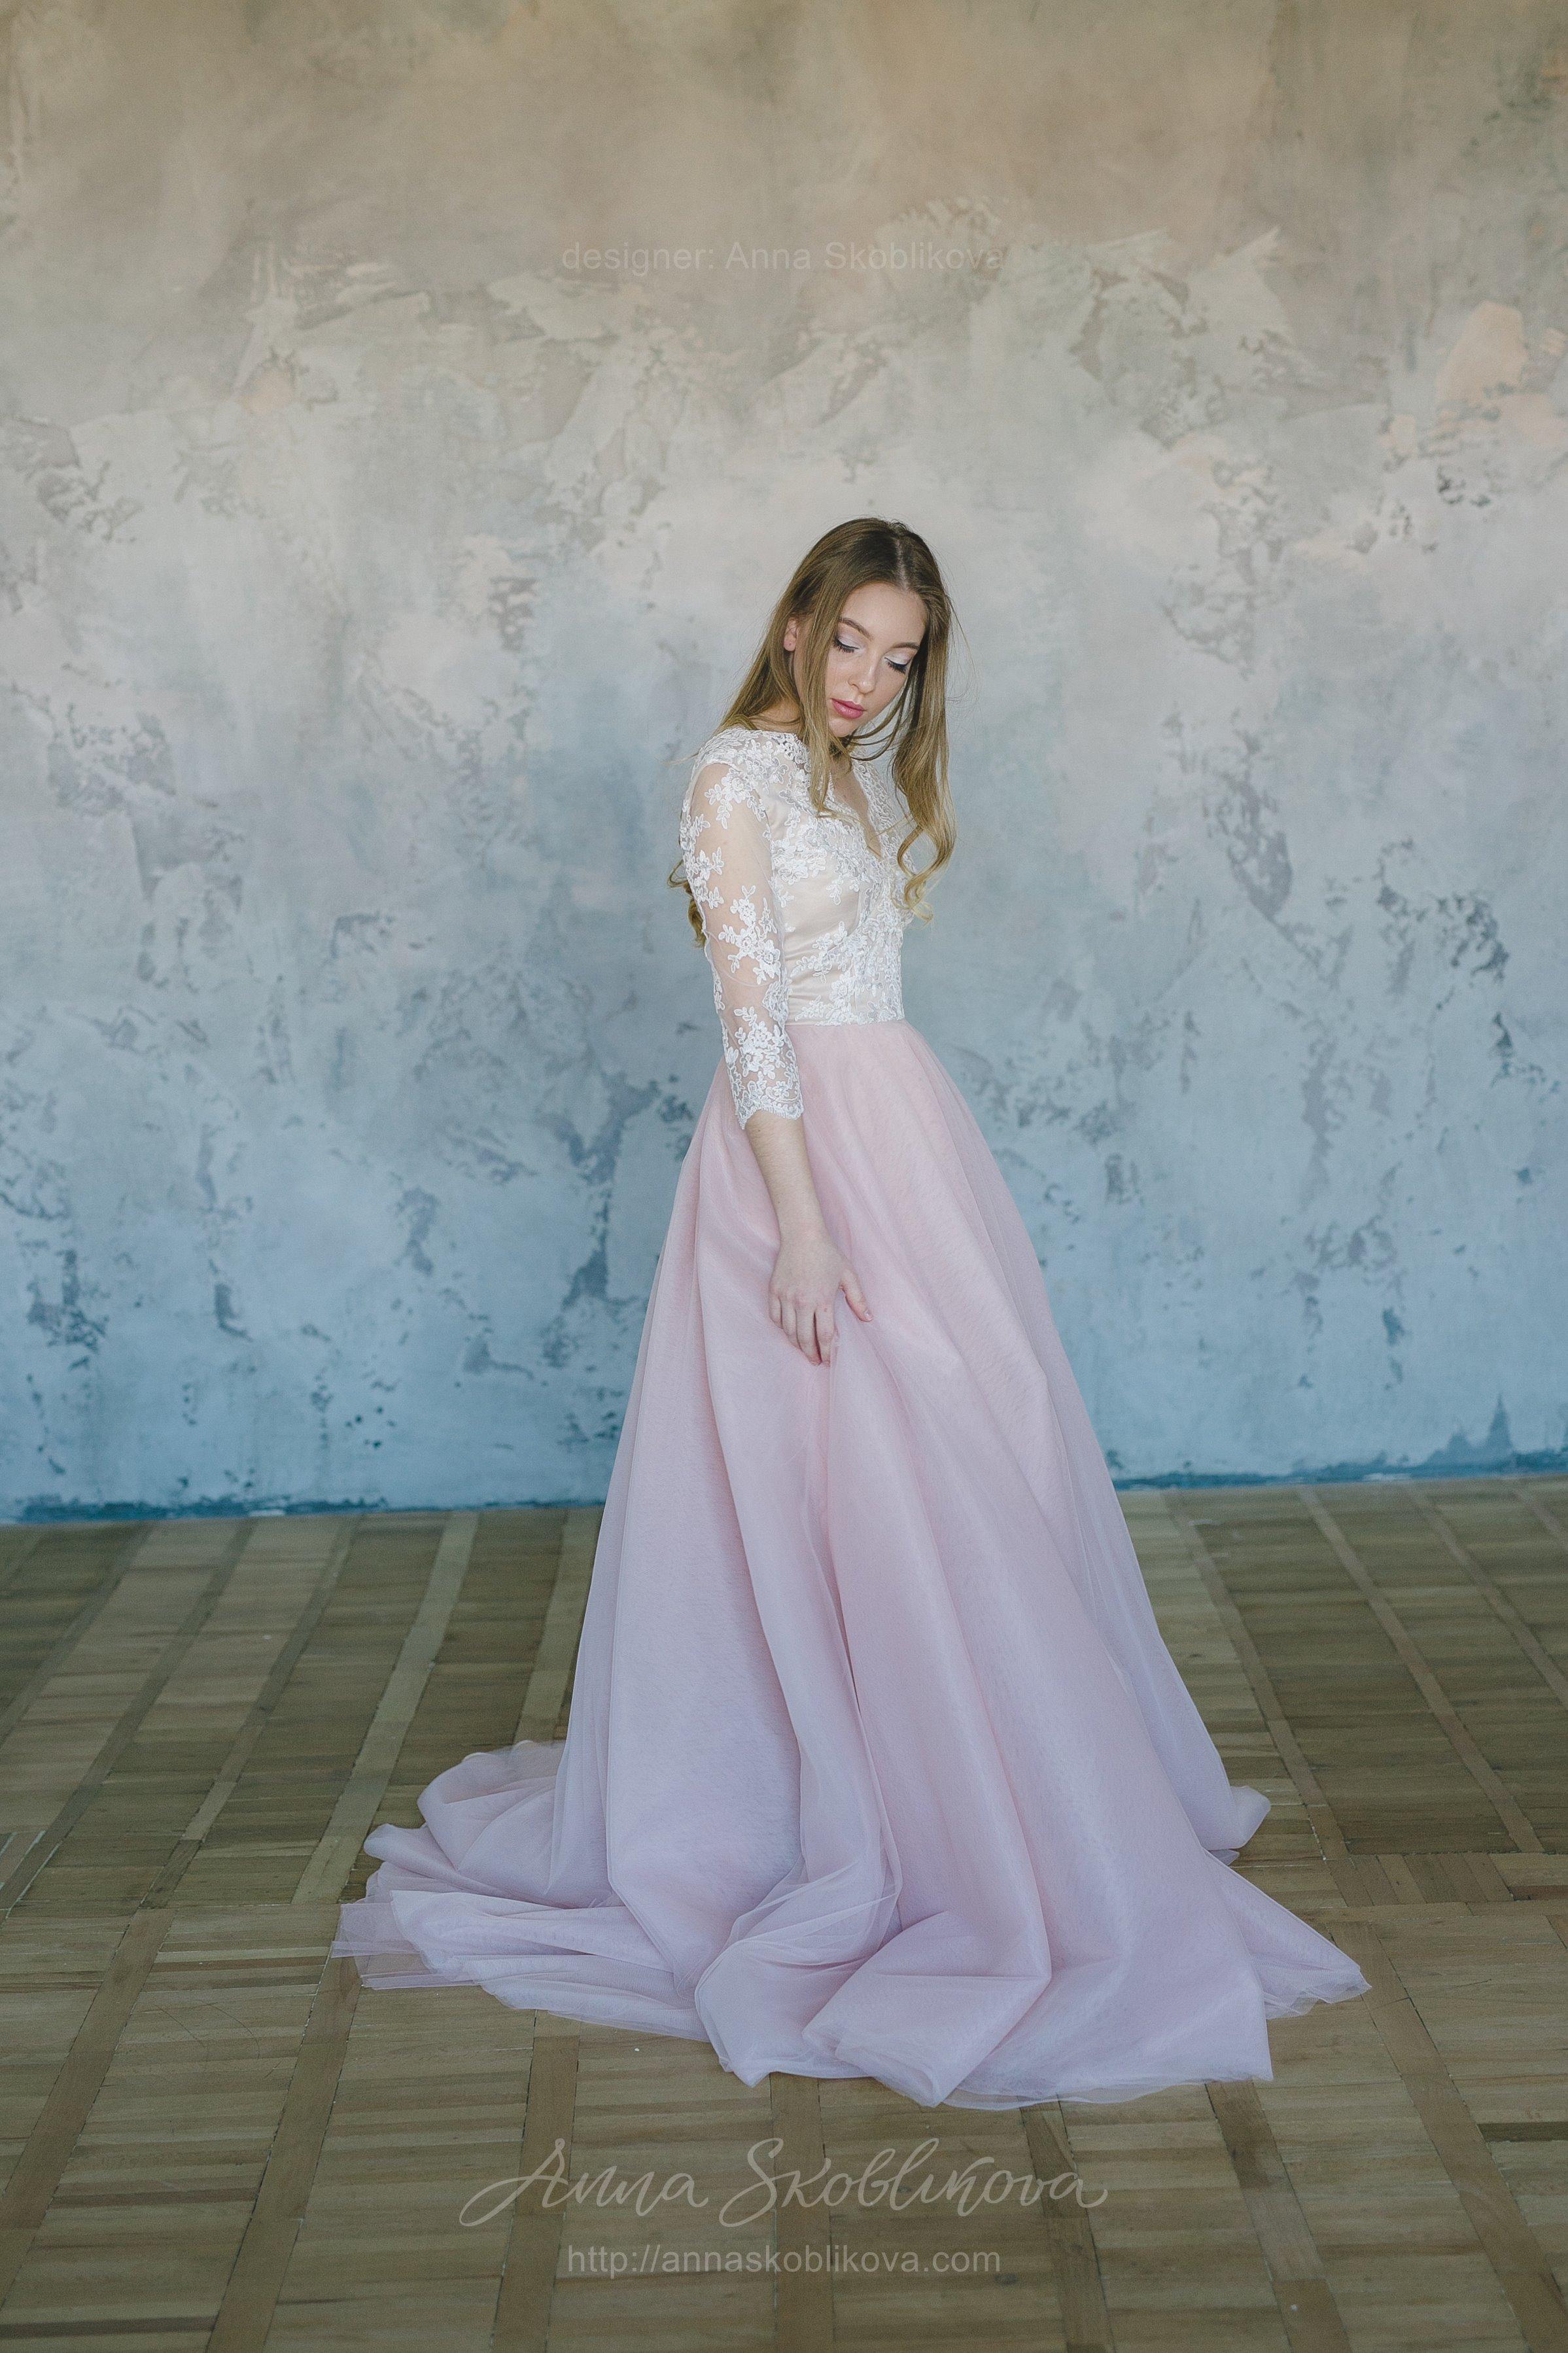 Wedding dress from powder tulle and milk lace | Anna Skoblikova ...